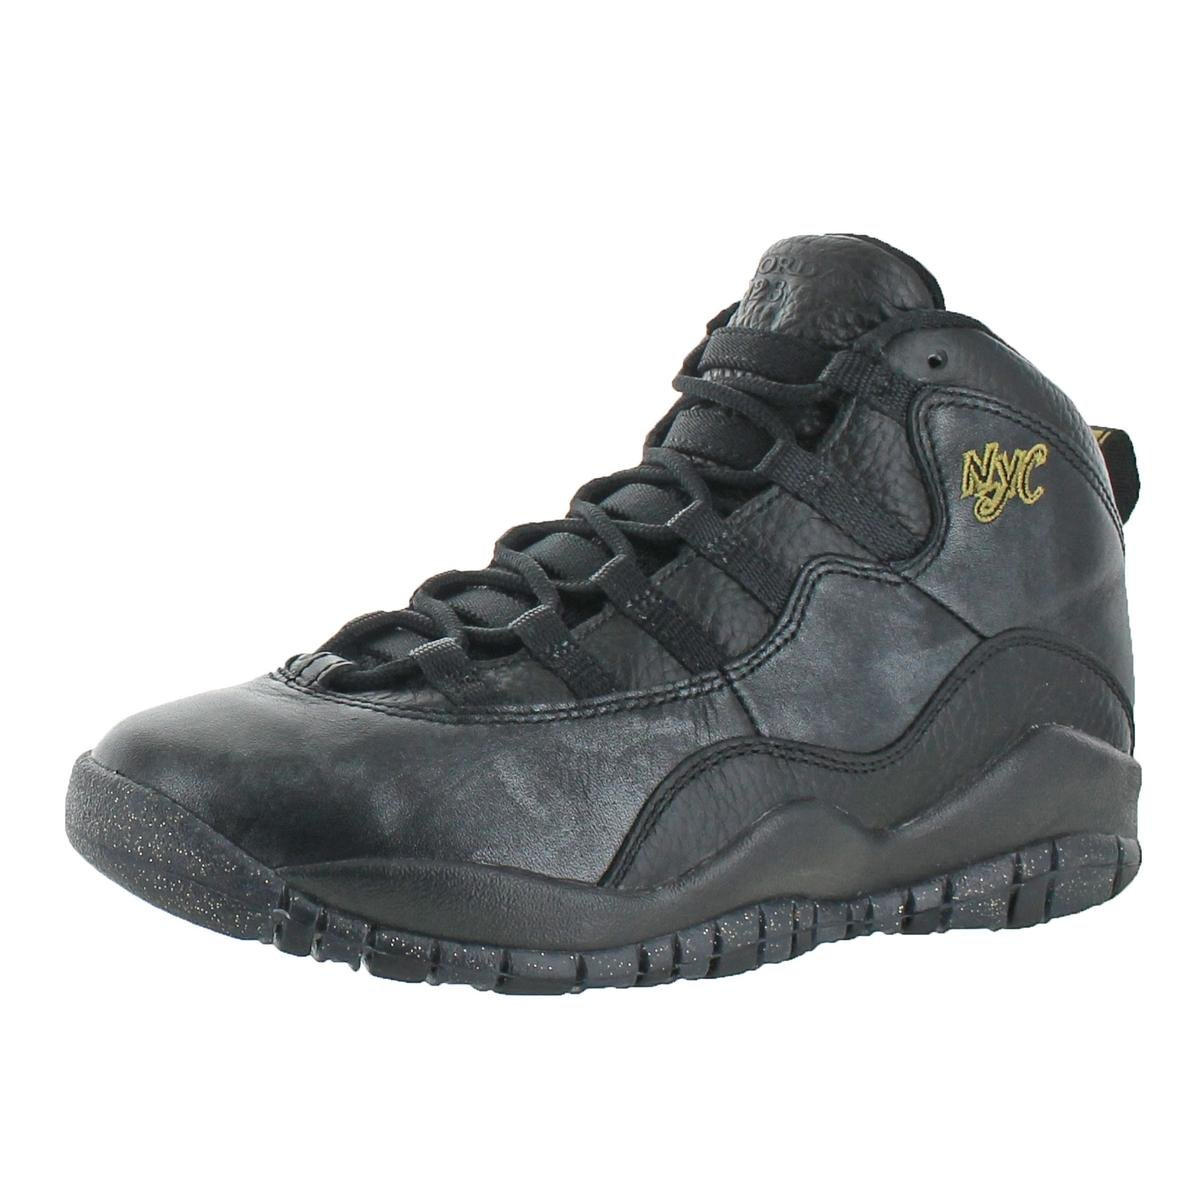 Jordan Boys Air 10 Retro BG Basketball Shoes Black 3.5 Medium (D) Big Kid by Jordan